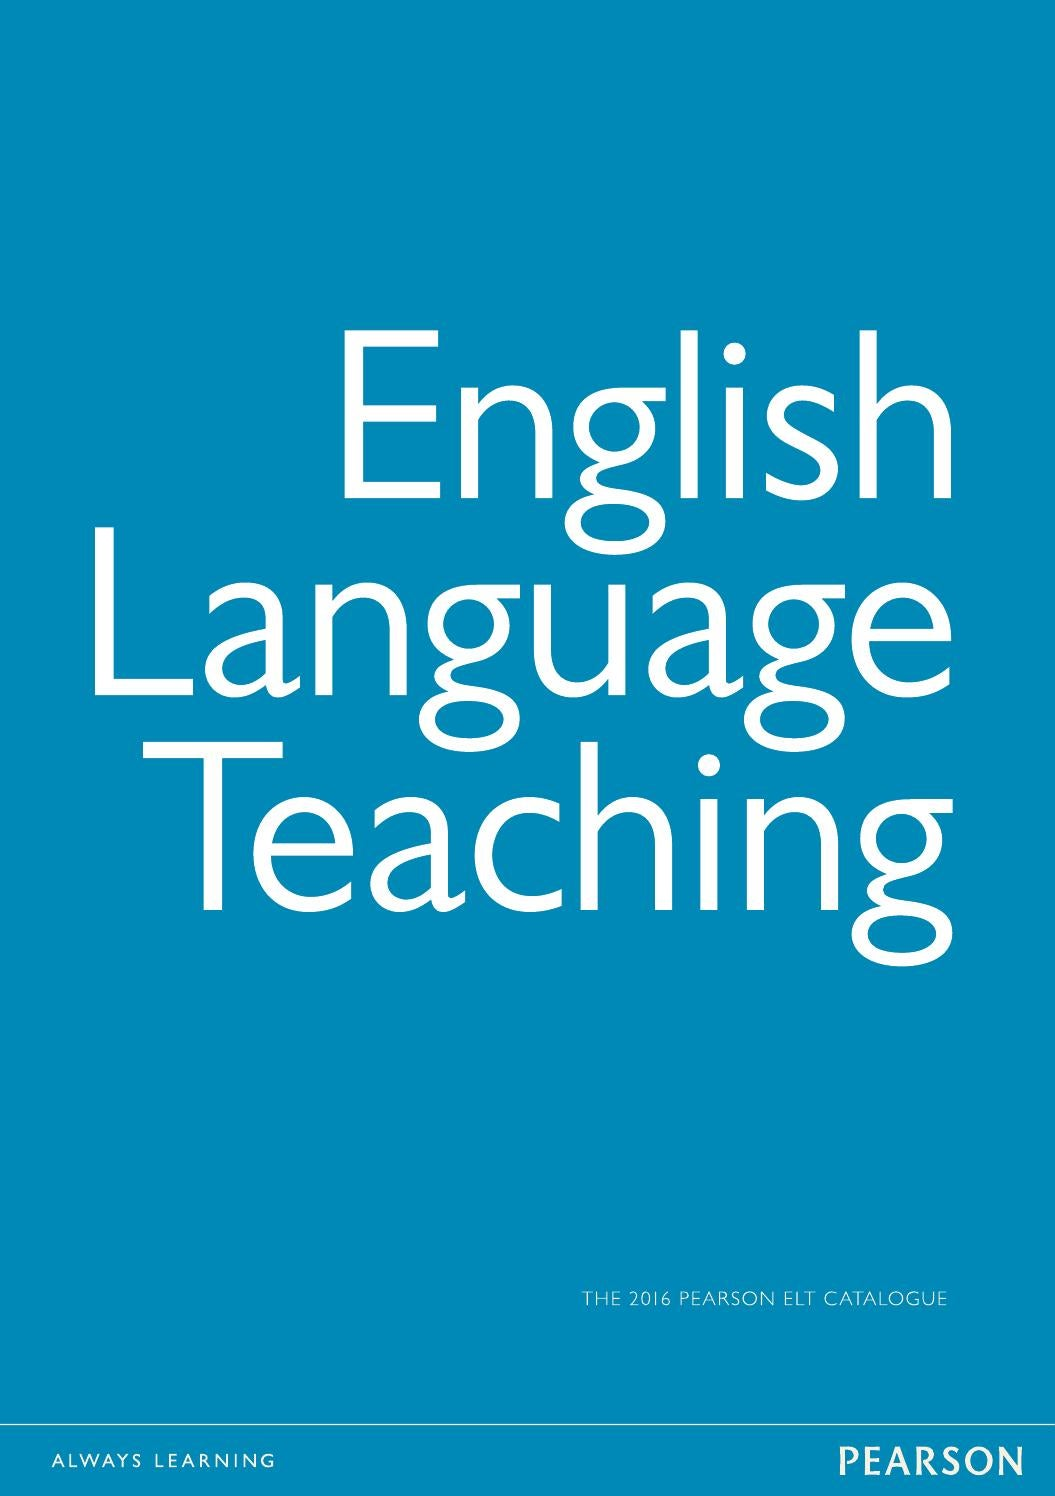 essay of english language teaching